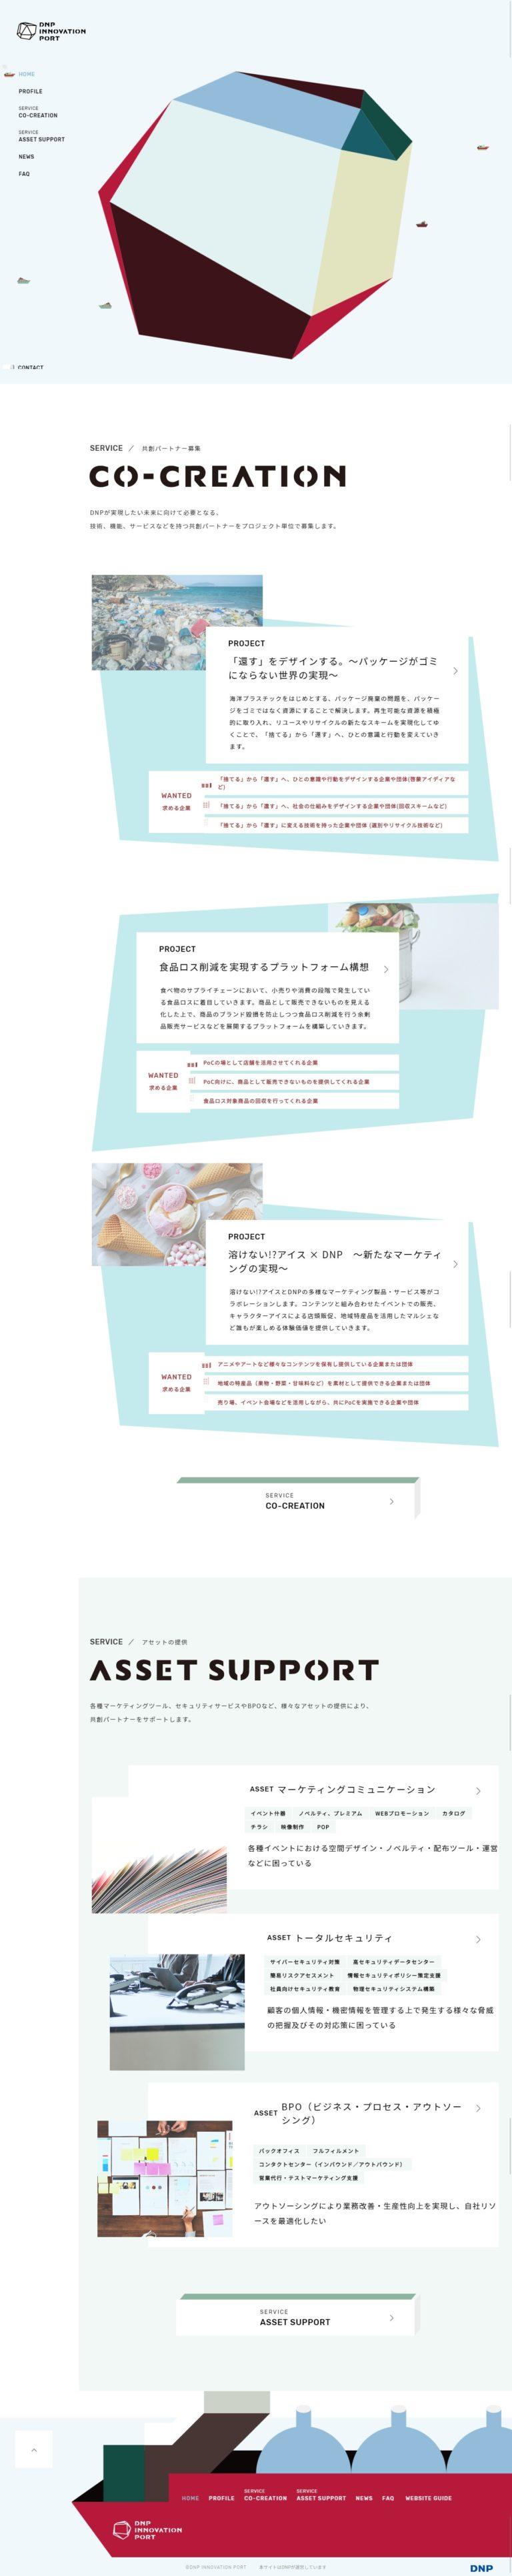 DNP INNOVATION PORT-大日本印刷株式会社